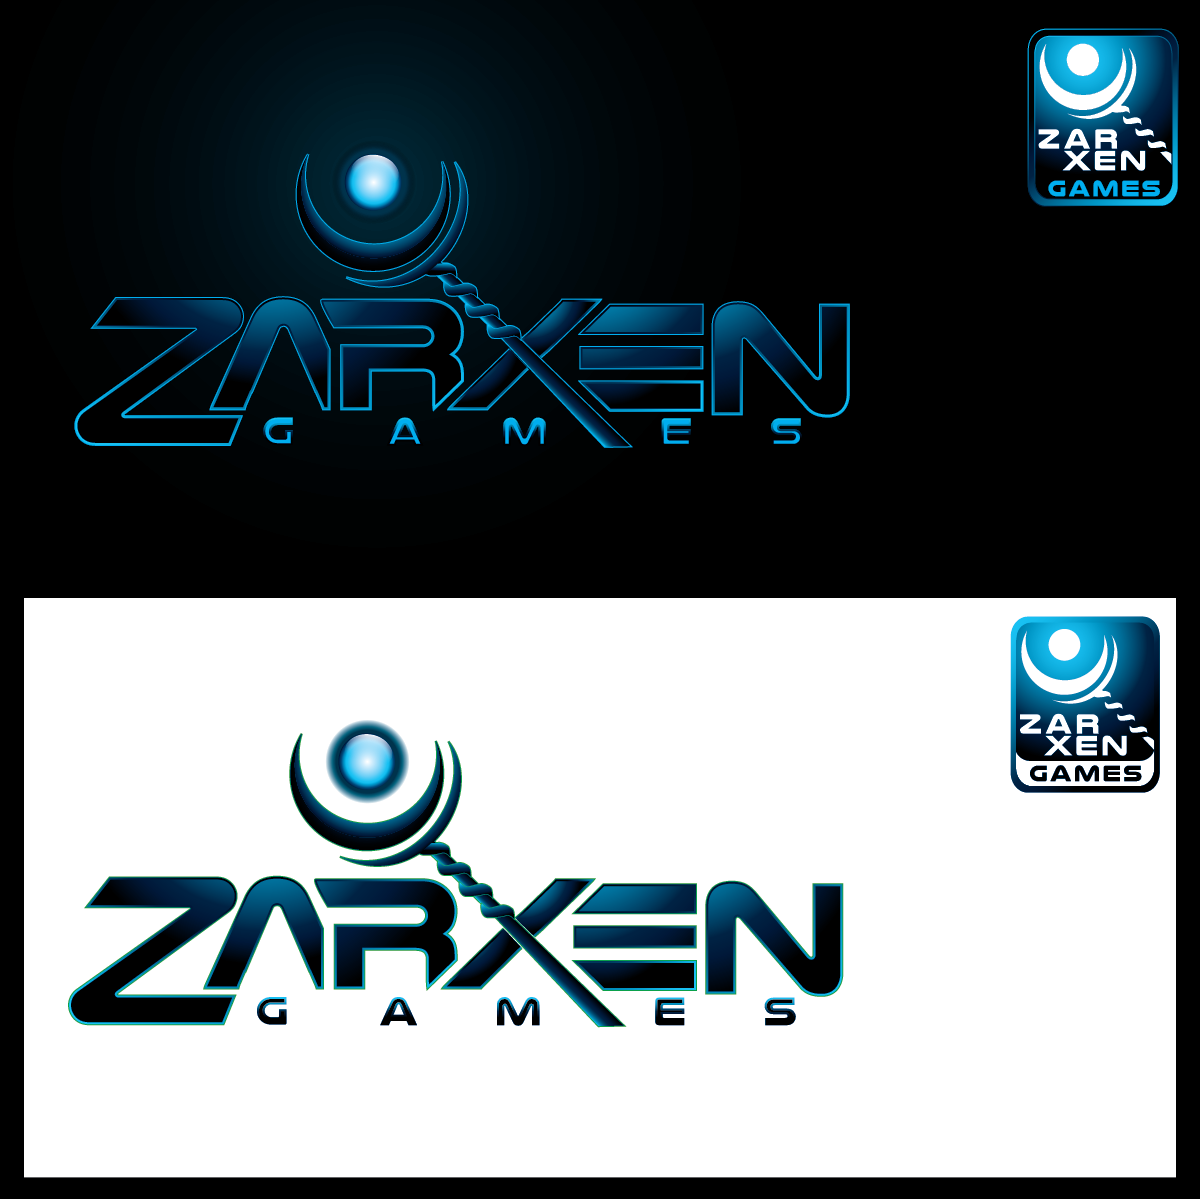 Create a logo for ZarXen Games, an independent game developer